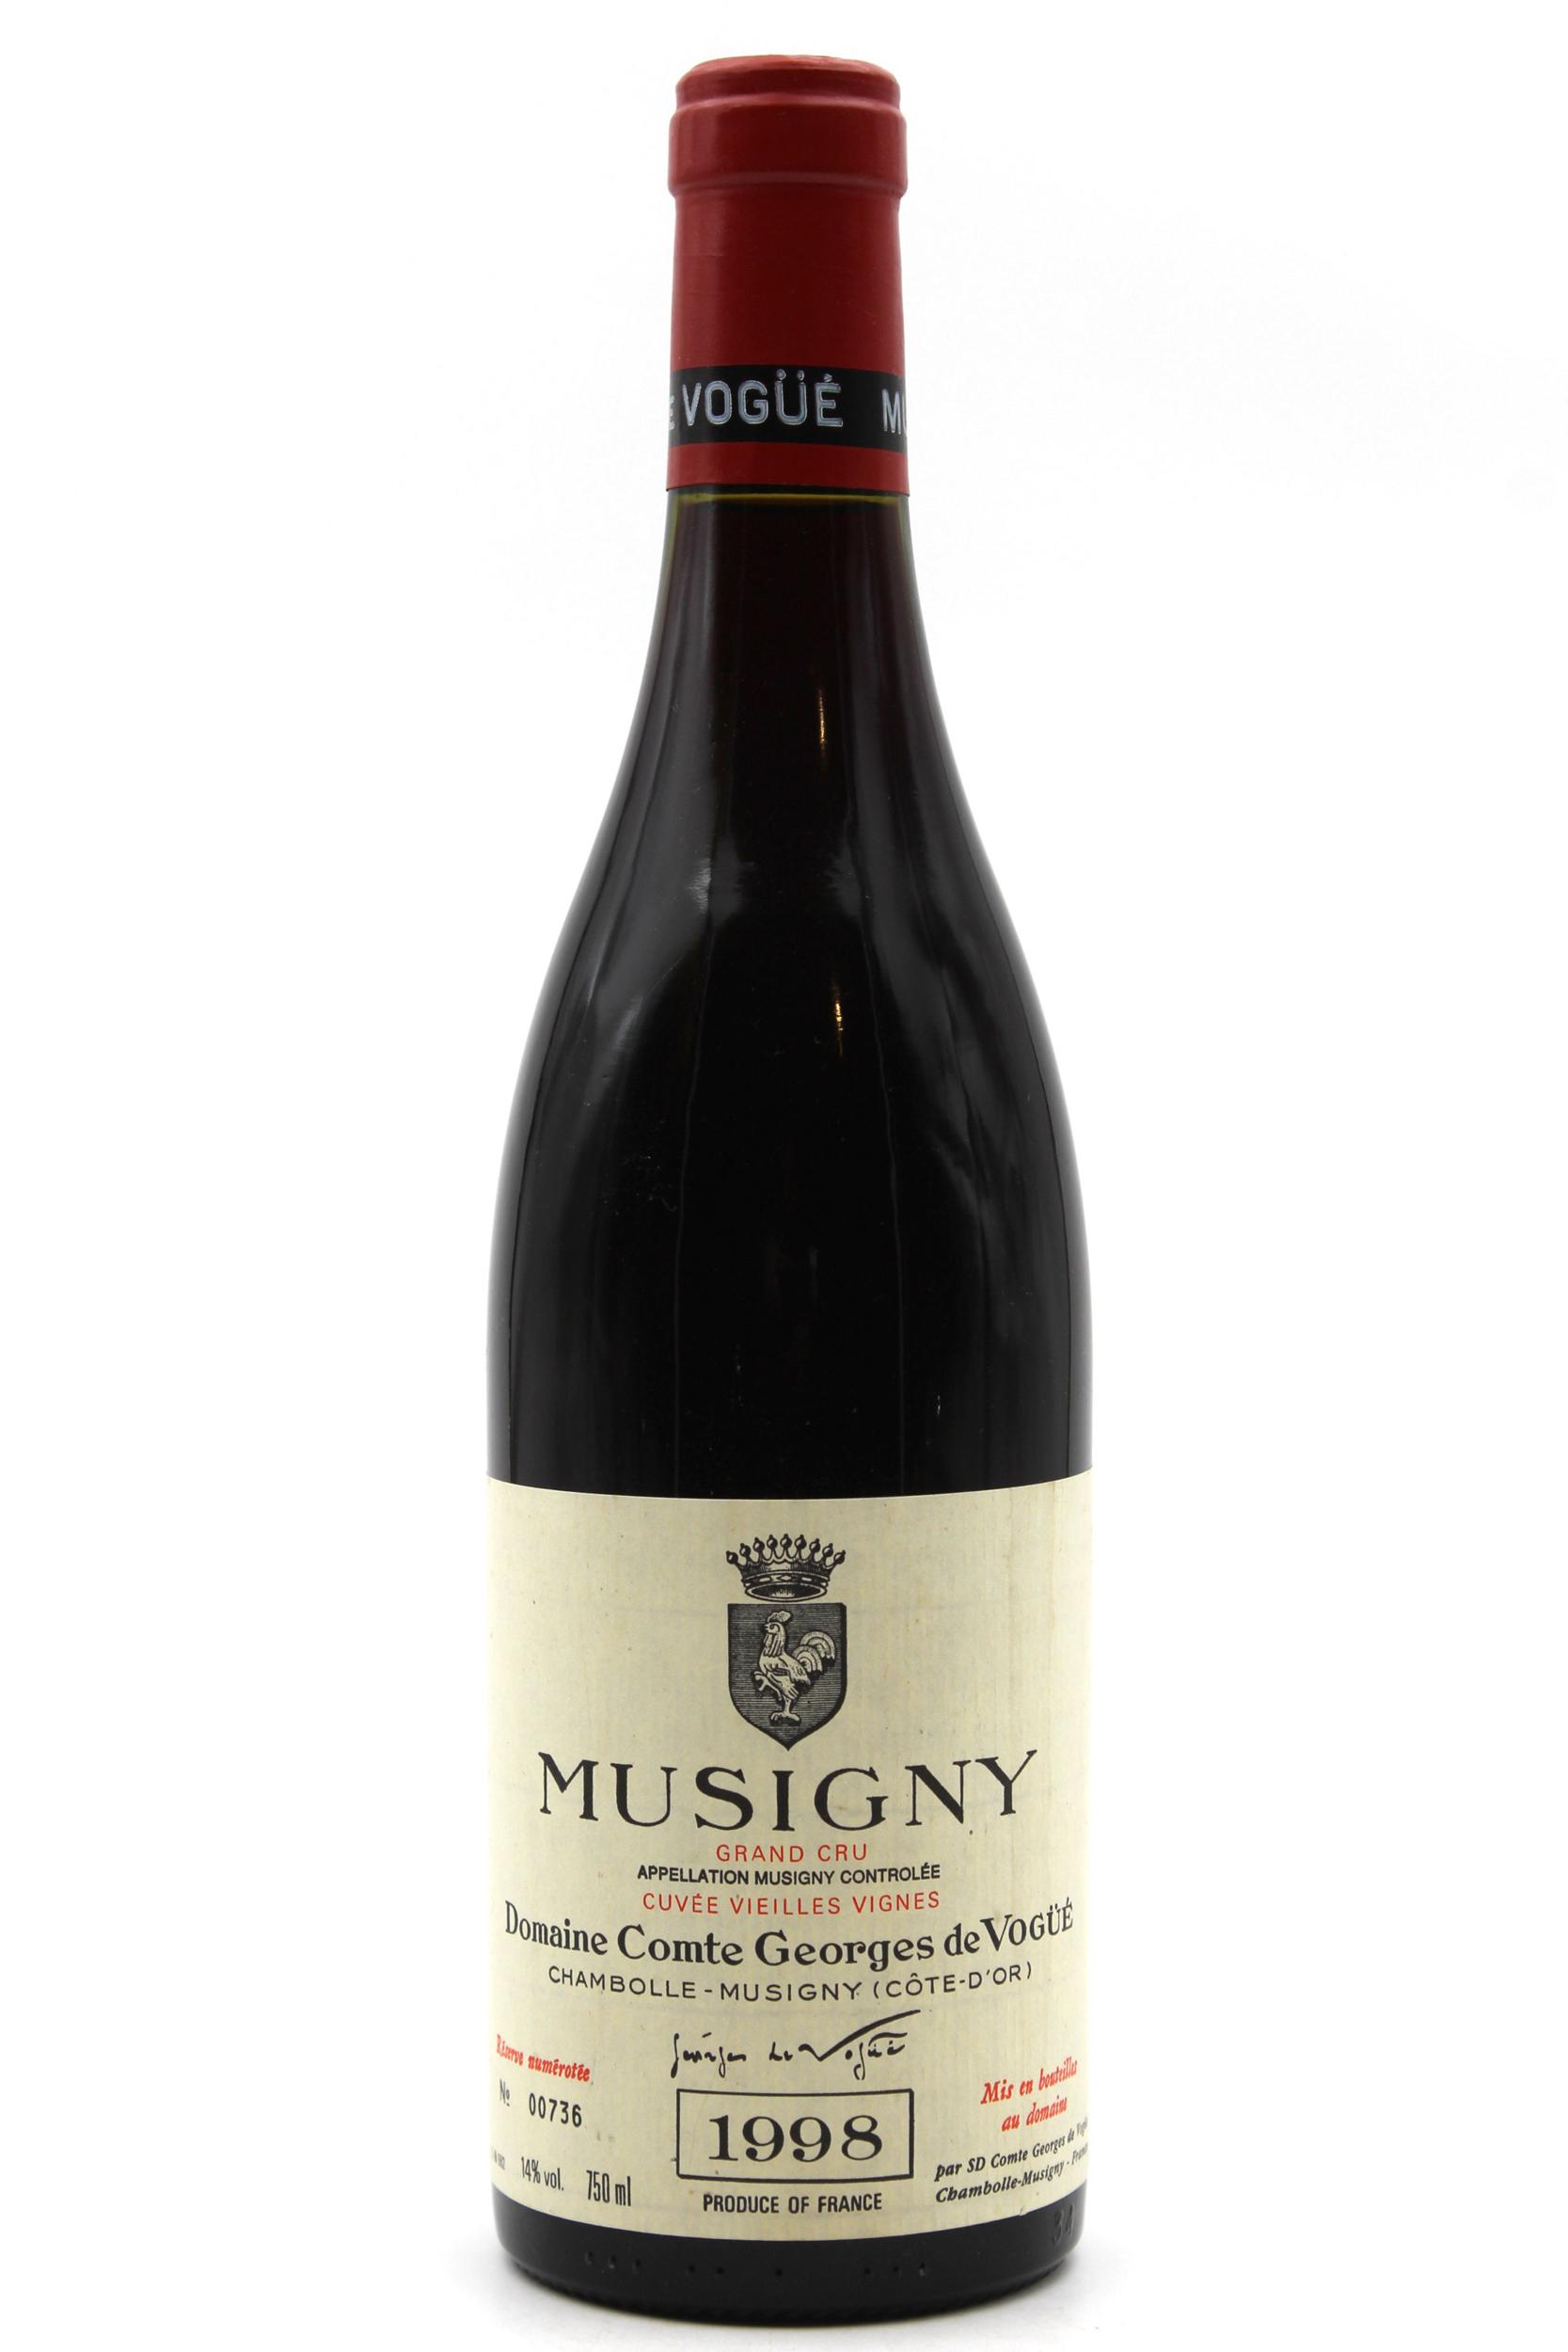 Musigny 1998 Grand Cru - Domaine Comte Georges de vogüé - Rouge - 75cl - AOC Bourgogne